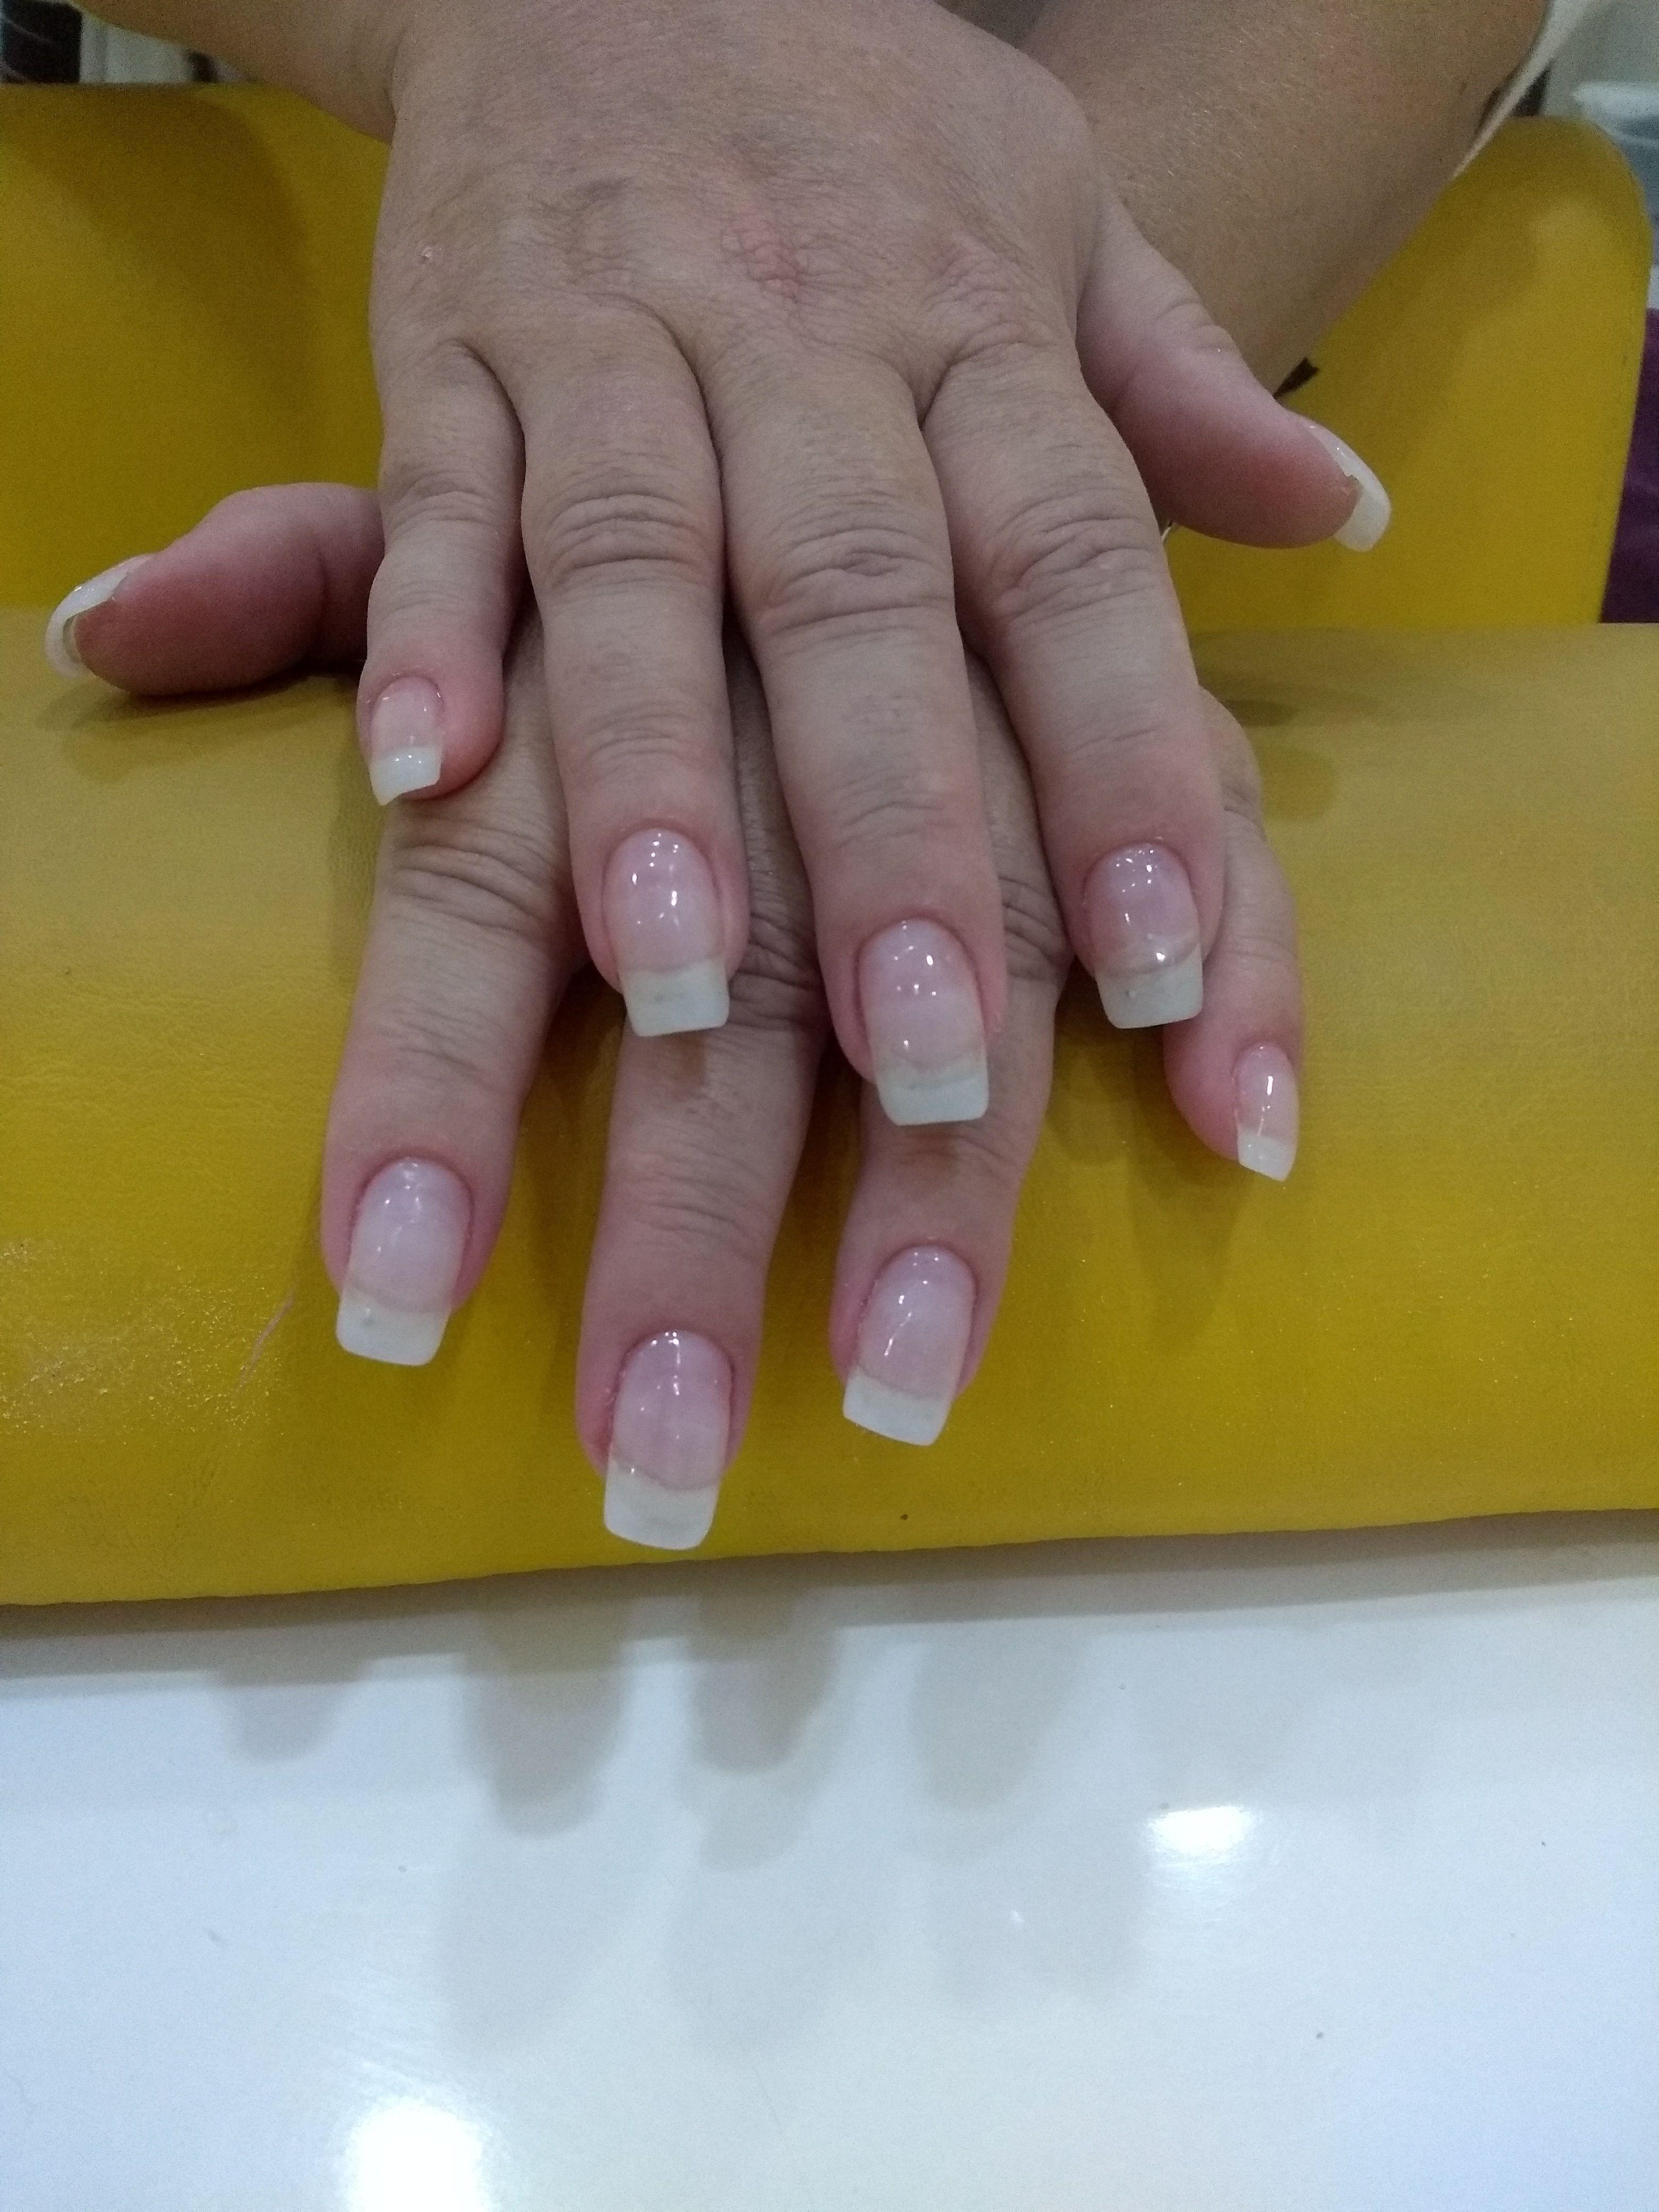 Manutenção de unha de gel unha manicure e pedicure